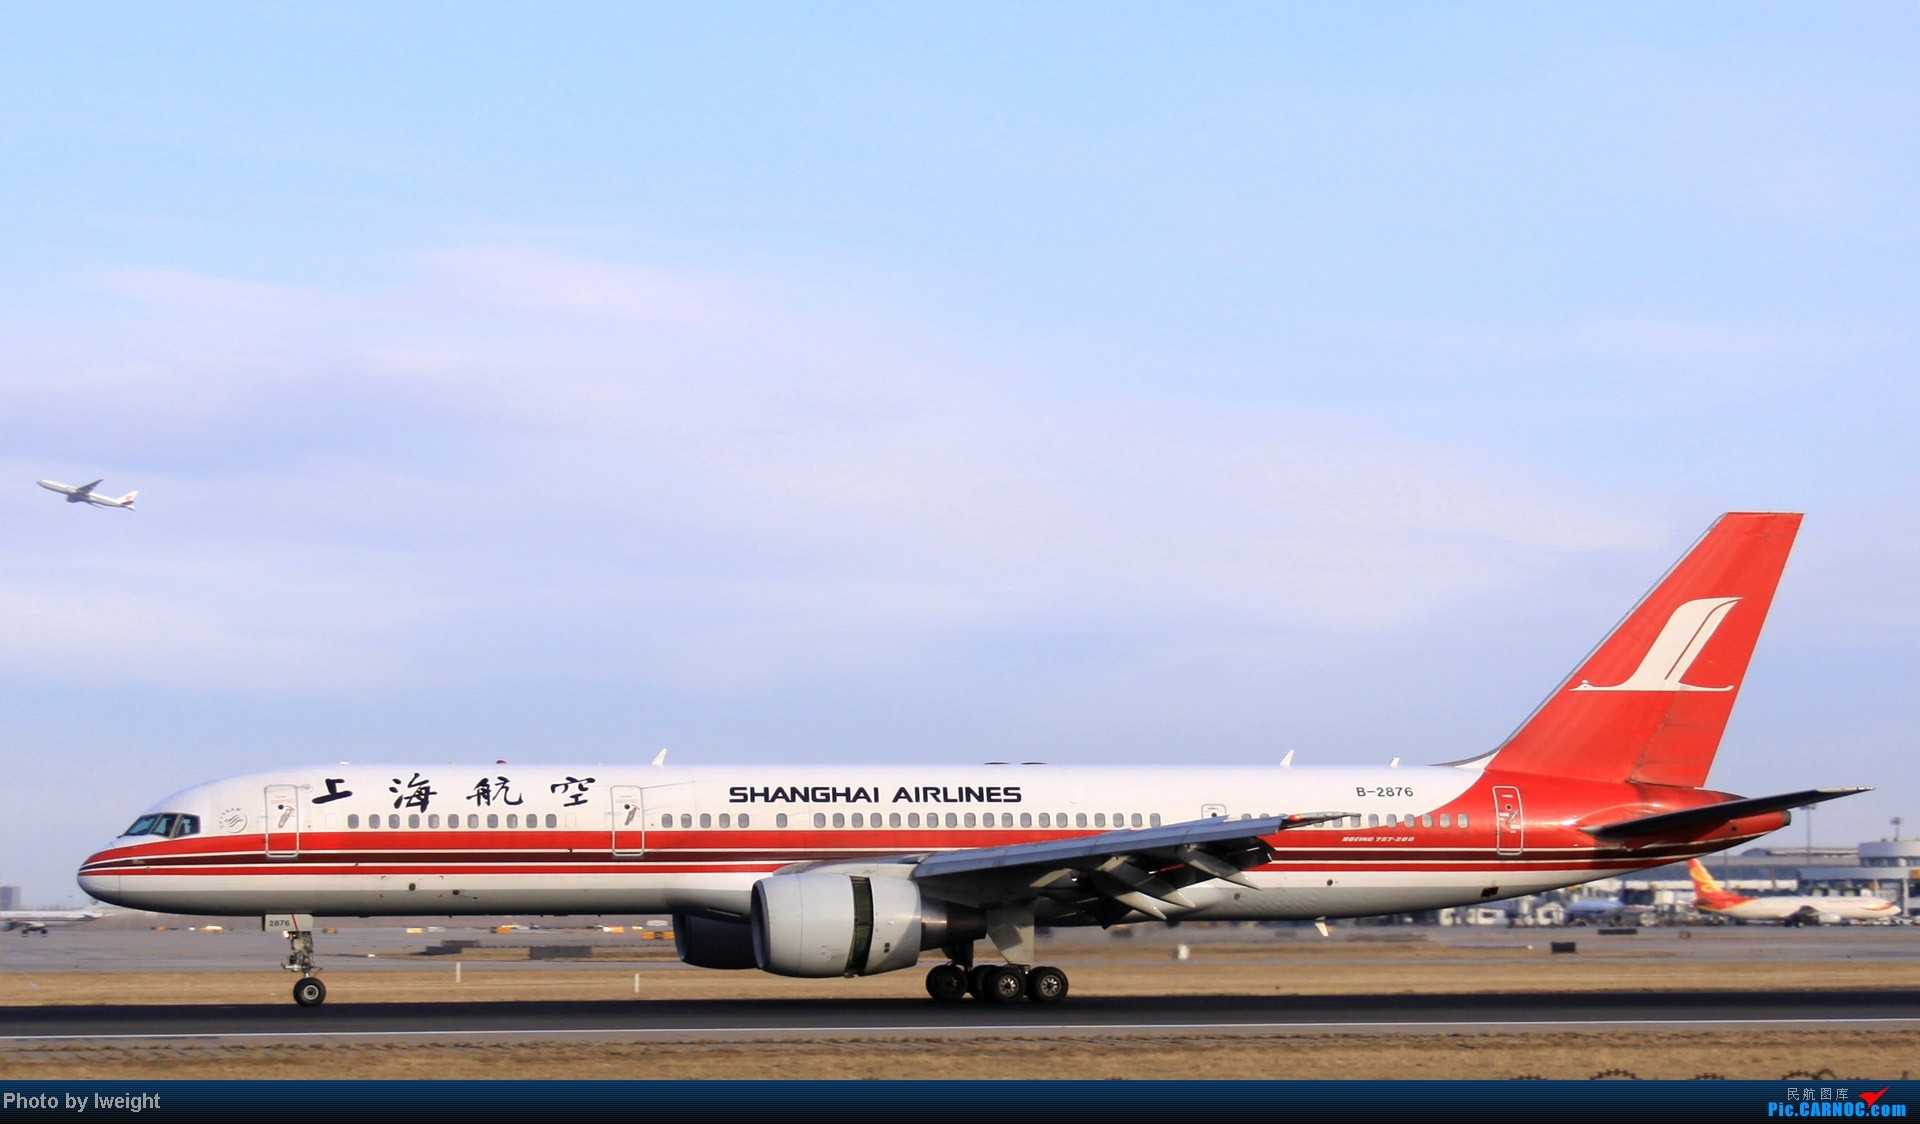 Re:[原创]今天下午瞎拍两个小时的杂图 BOEING 757-200 B-2876 中国北京首都机场